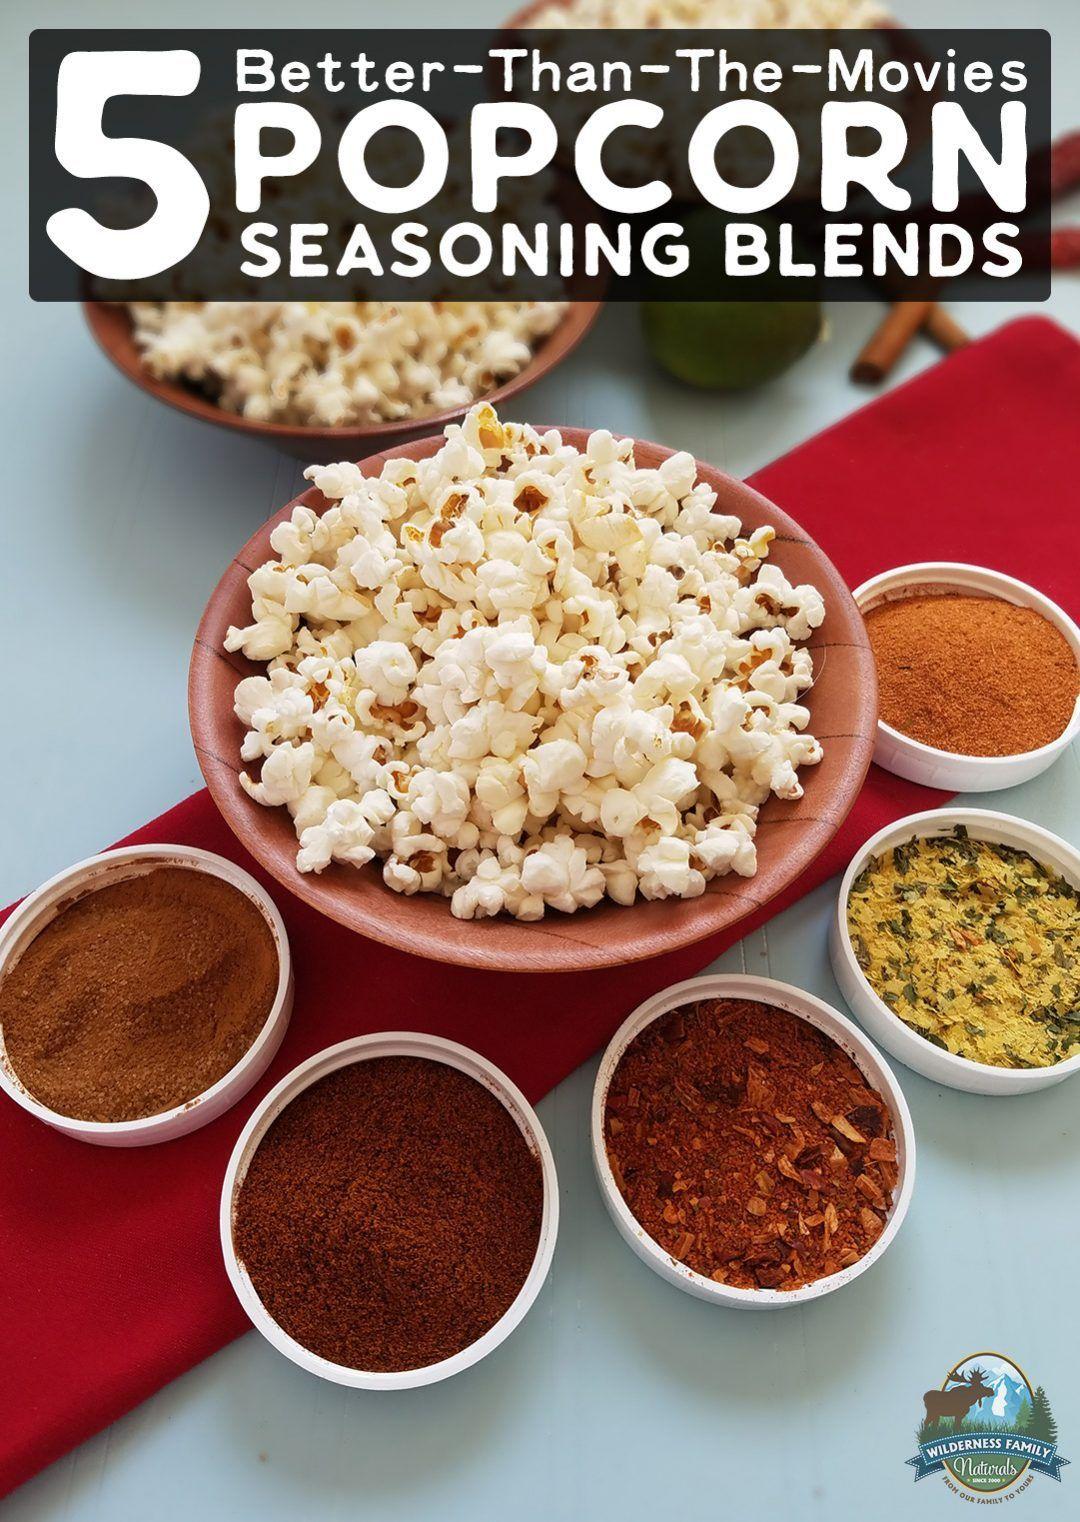 5 Tasty Popcorn Recipes